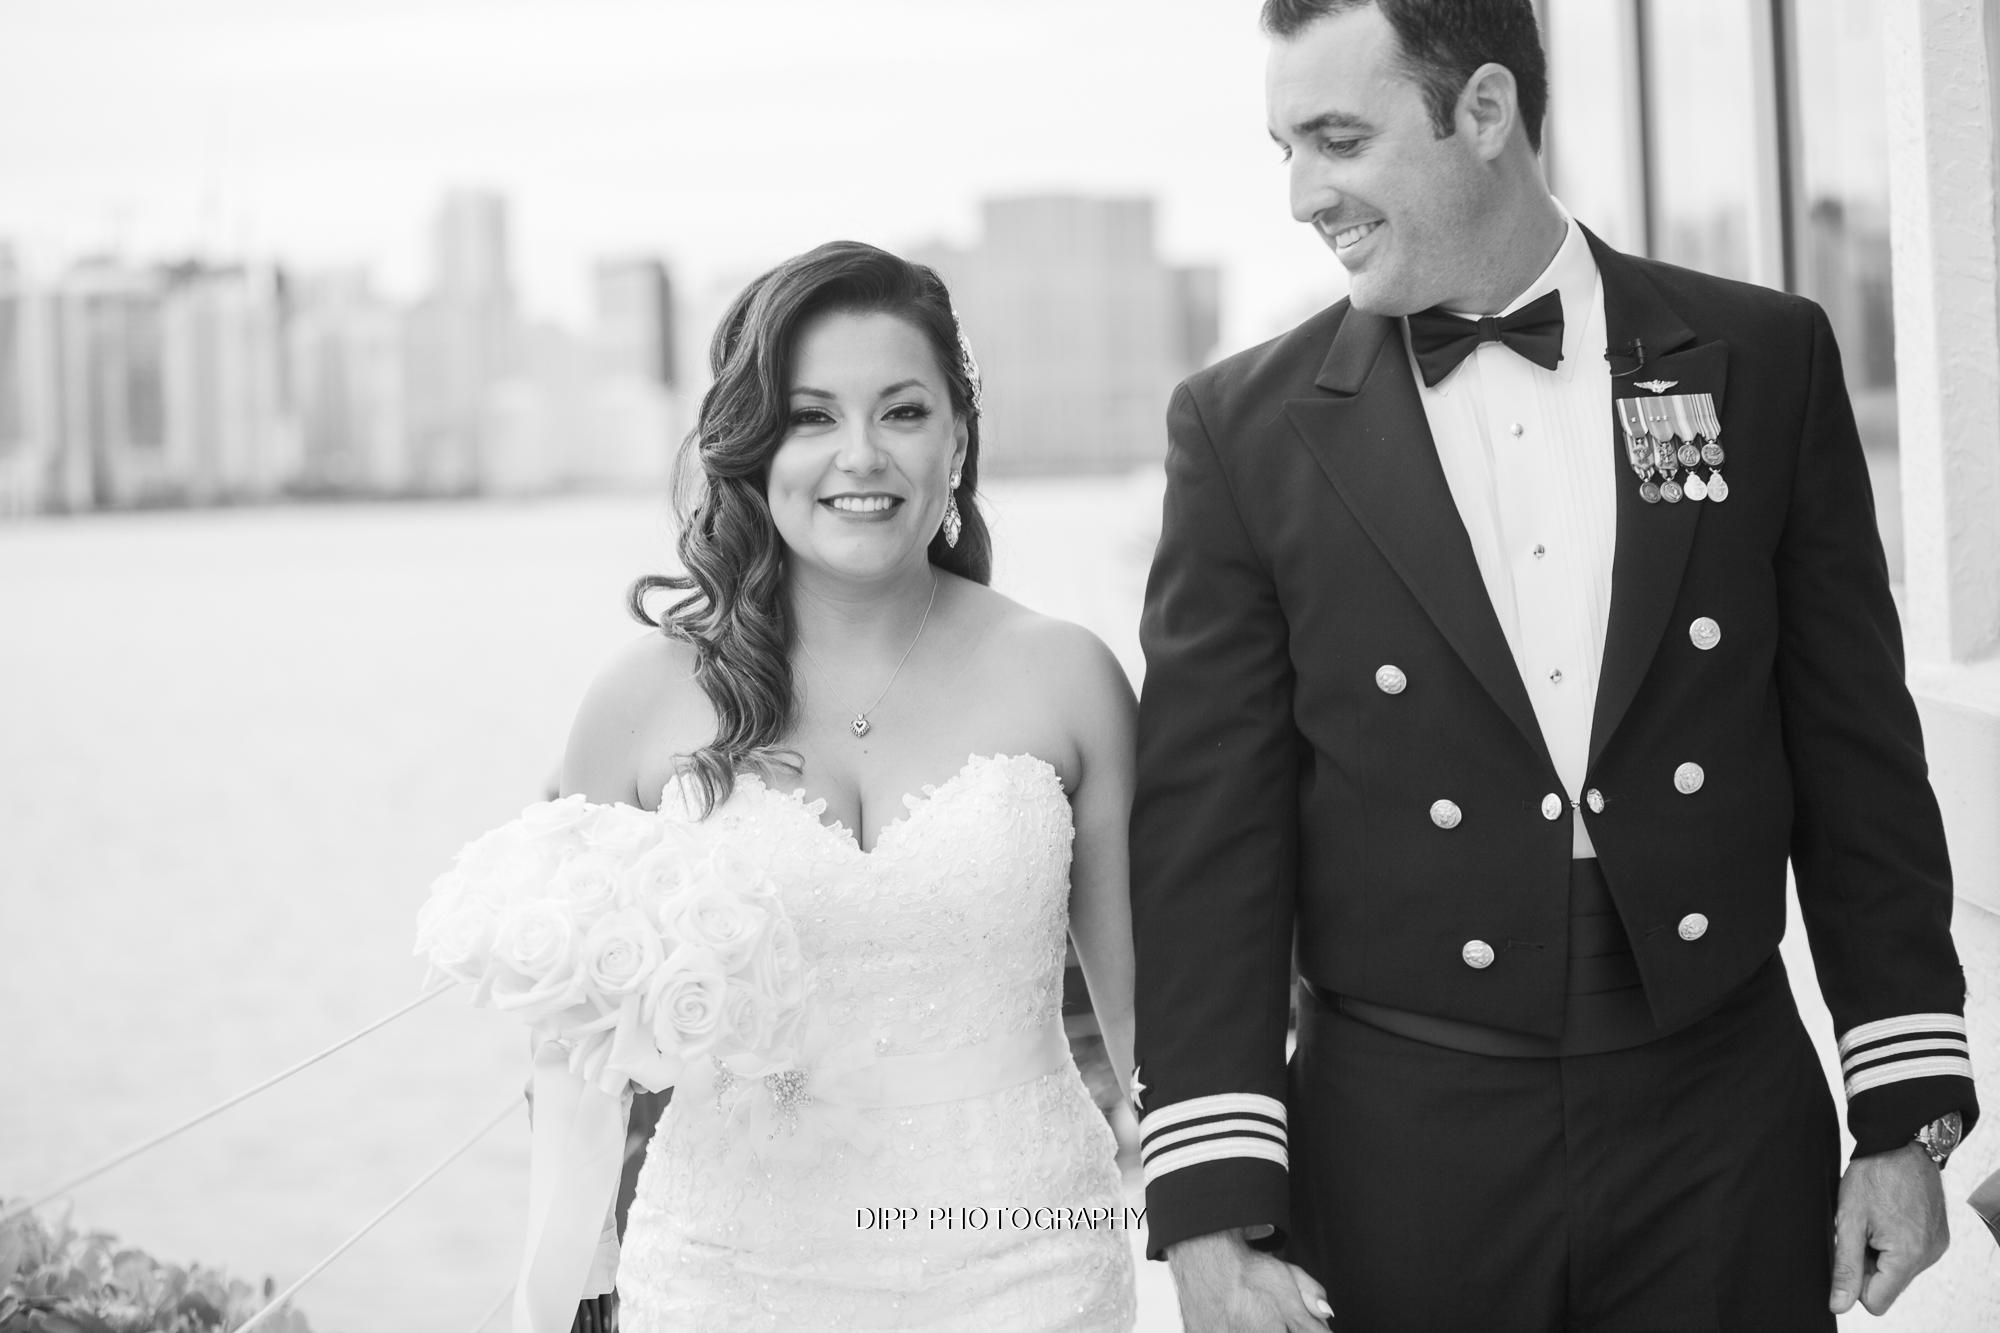 Dipp_2016 EDITED Sara & Brandon Wedding-124